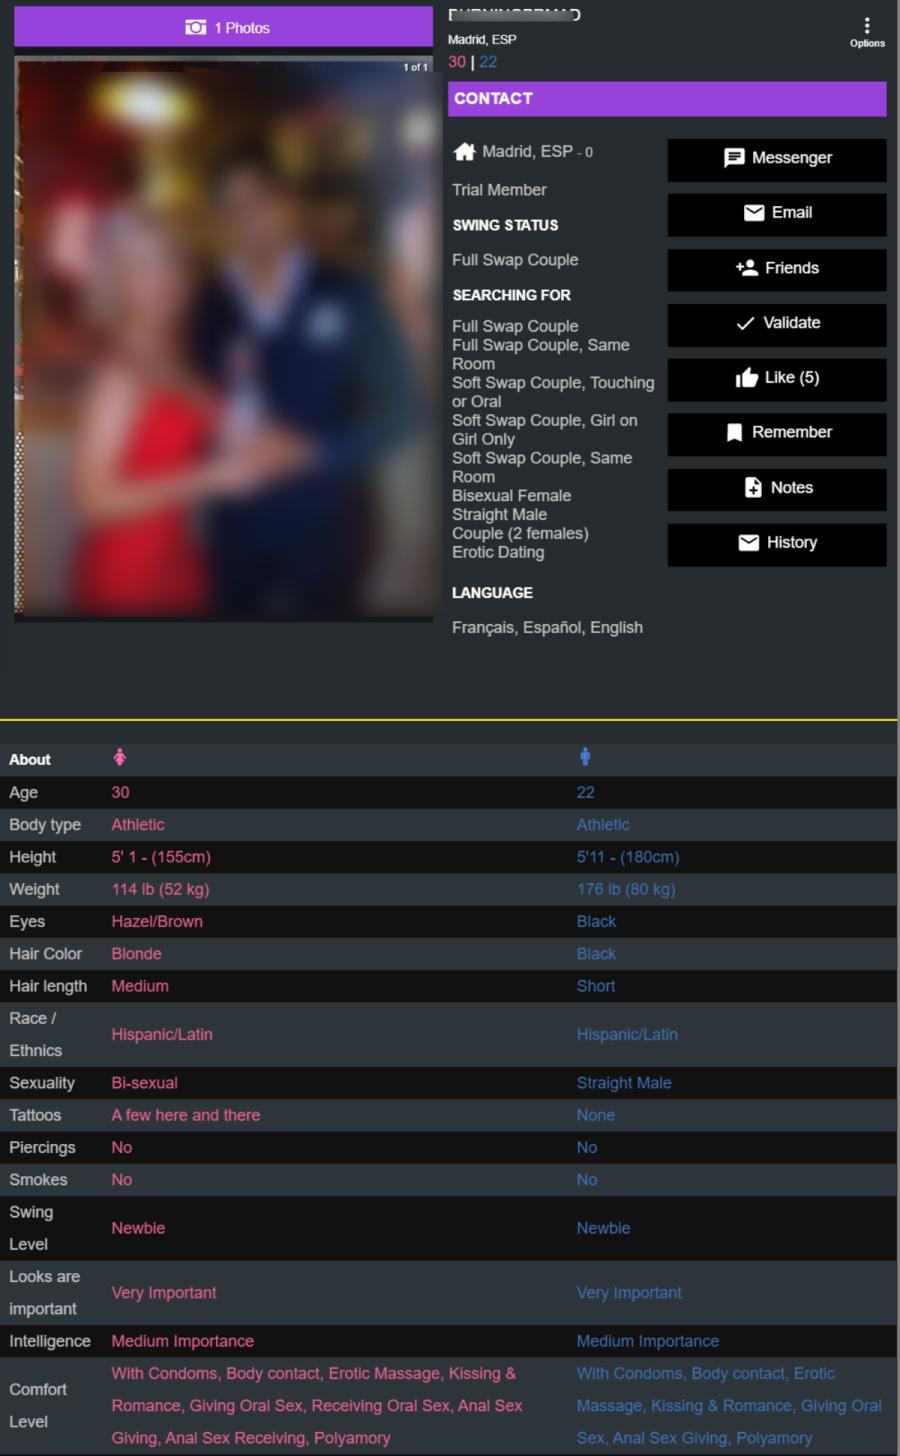 sdc perfil pareja swingers españa